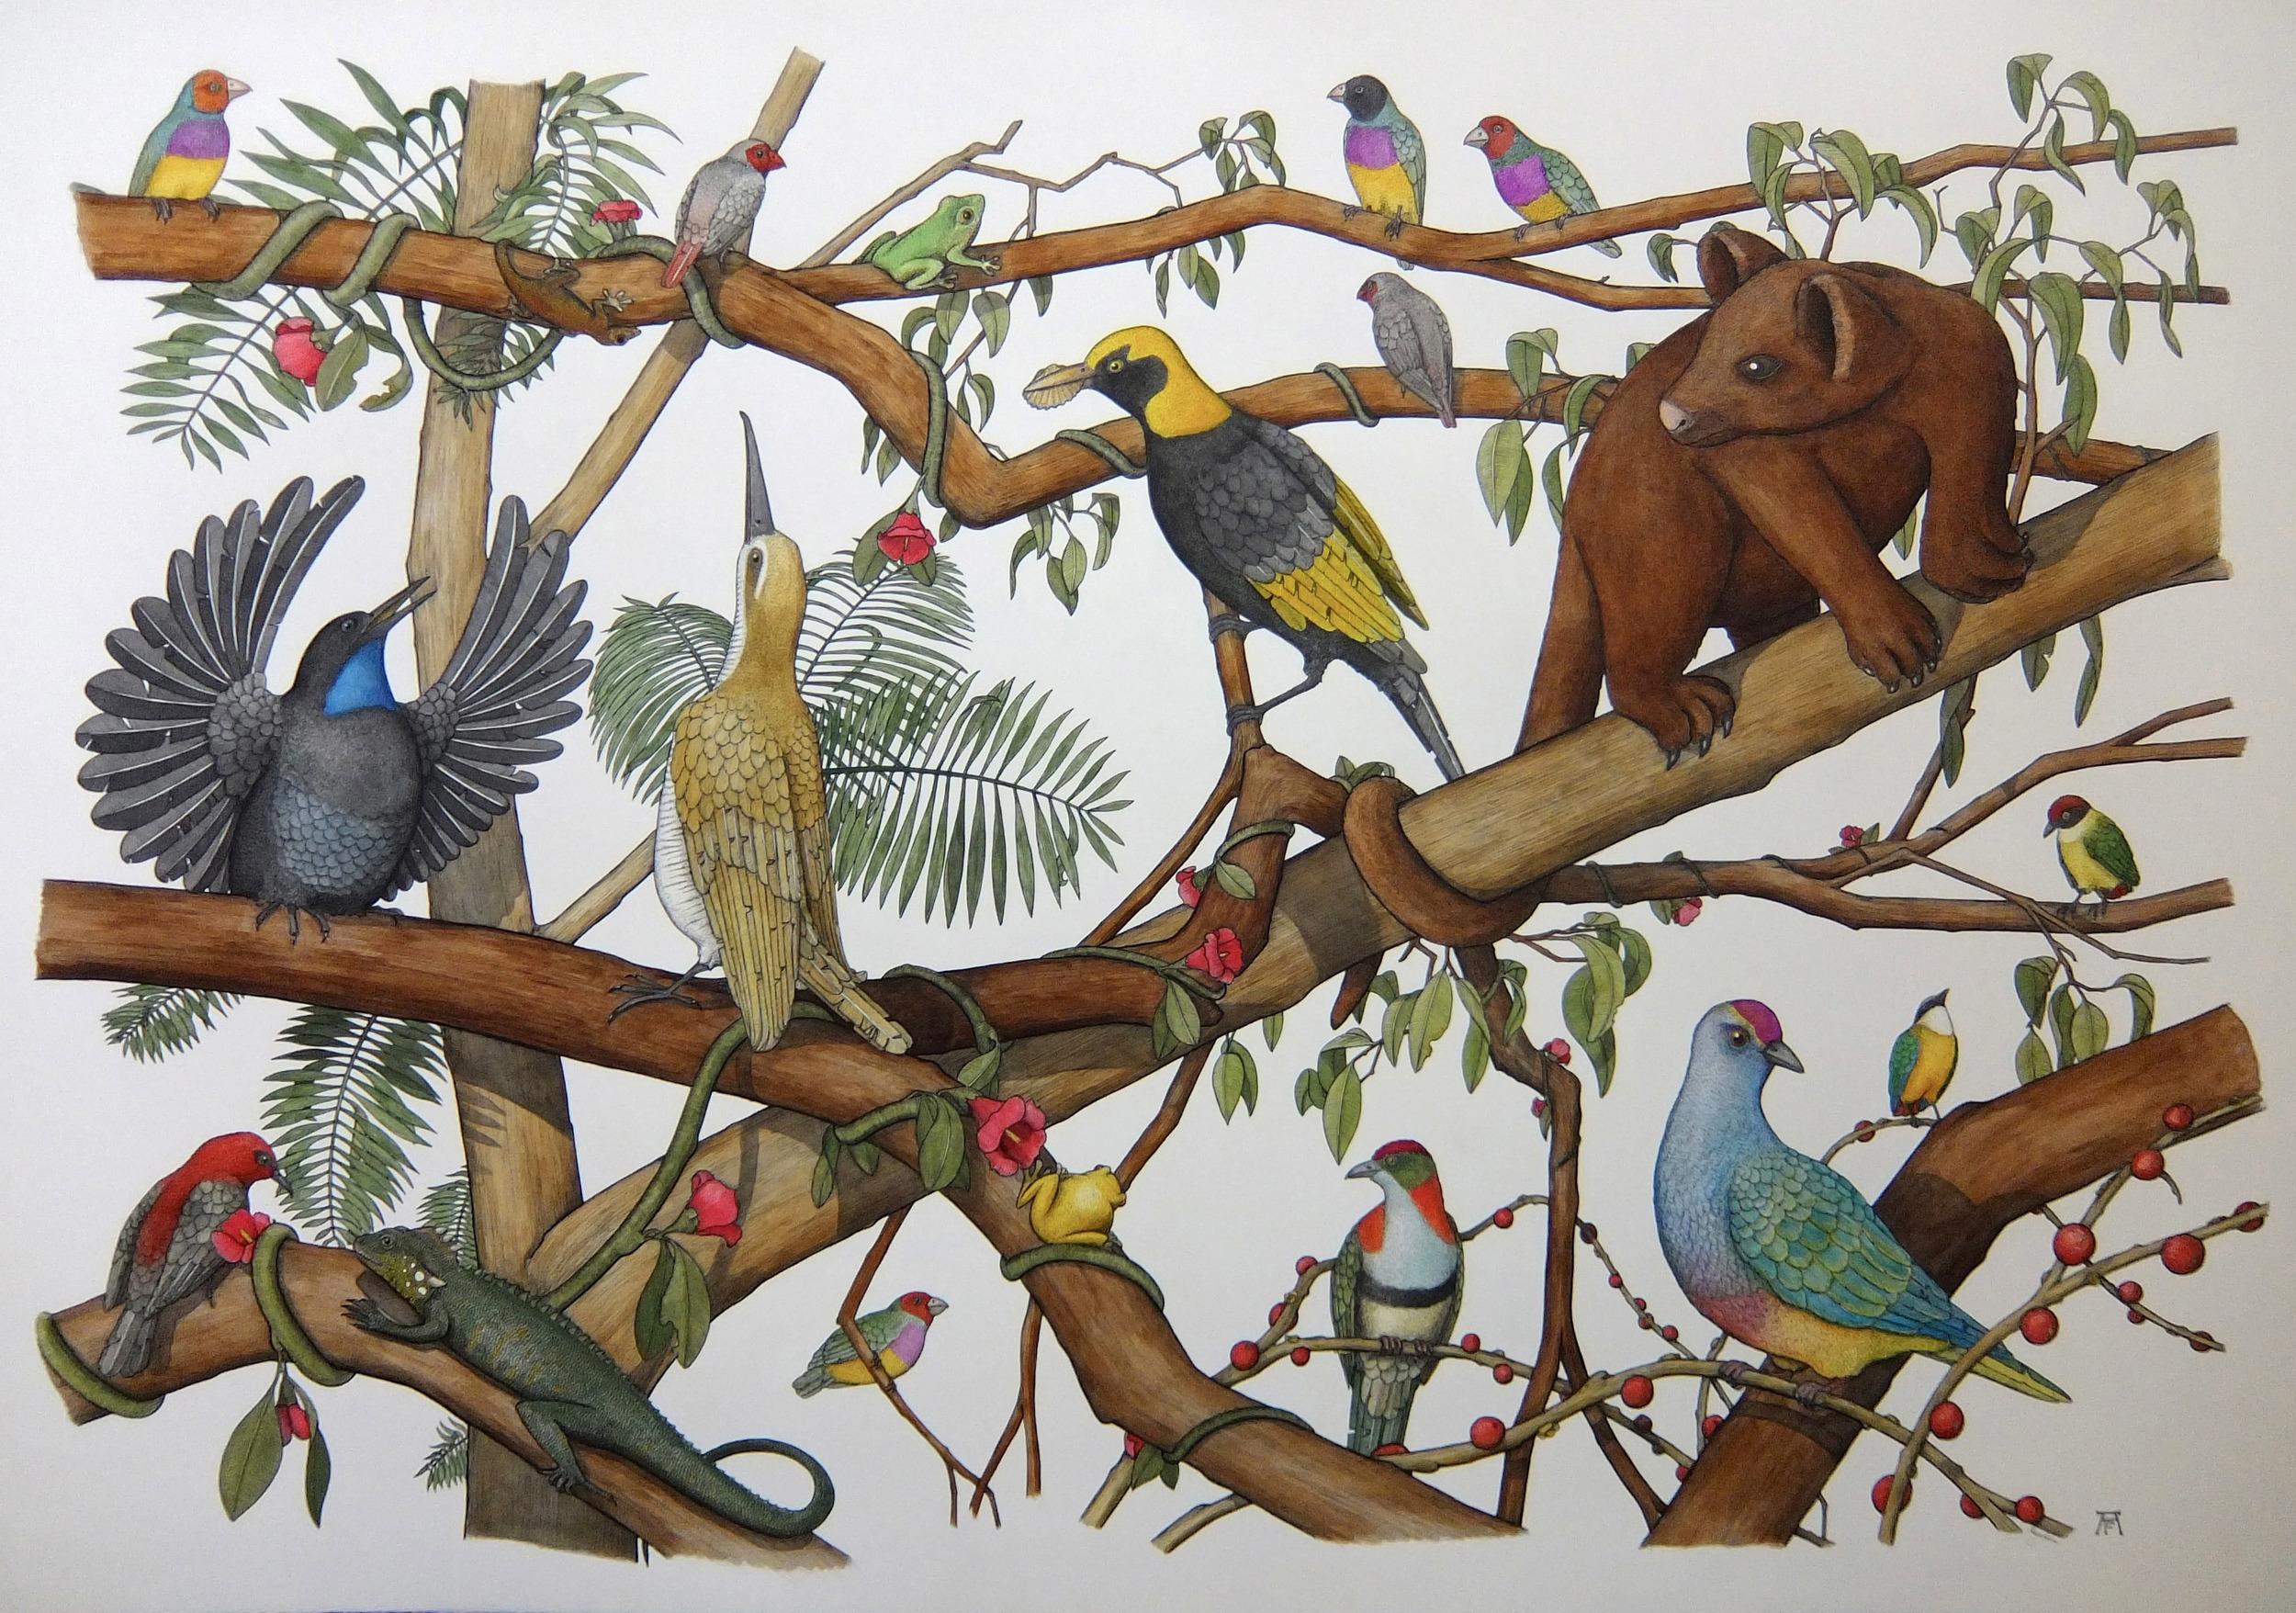 'The Daintree Rainforest'